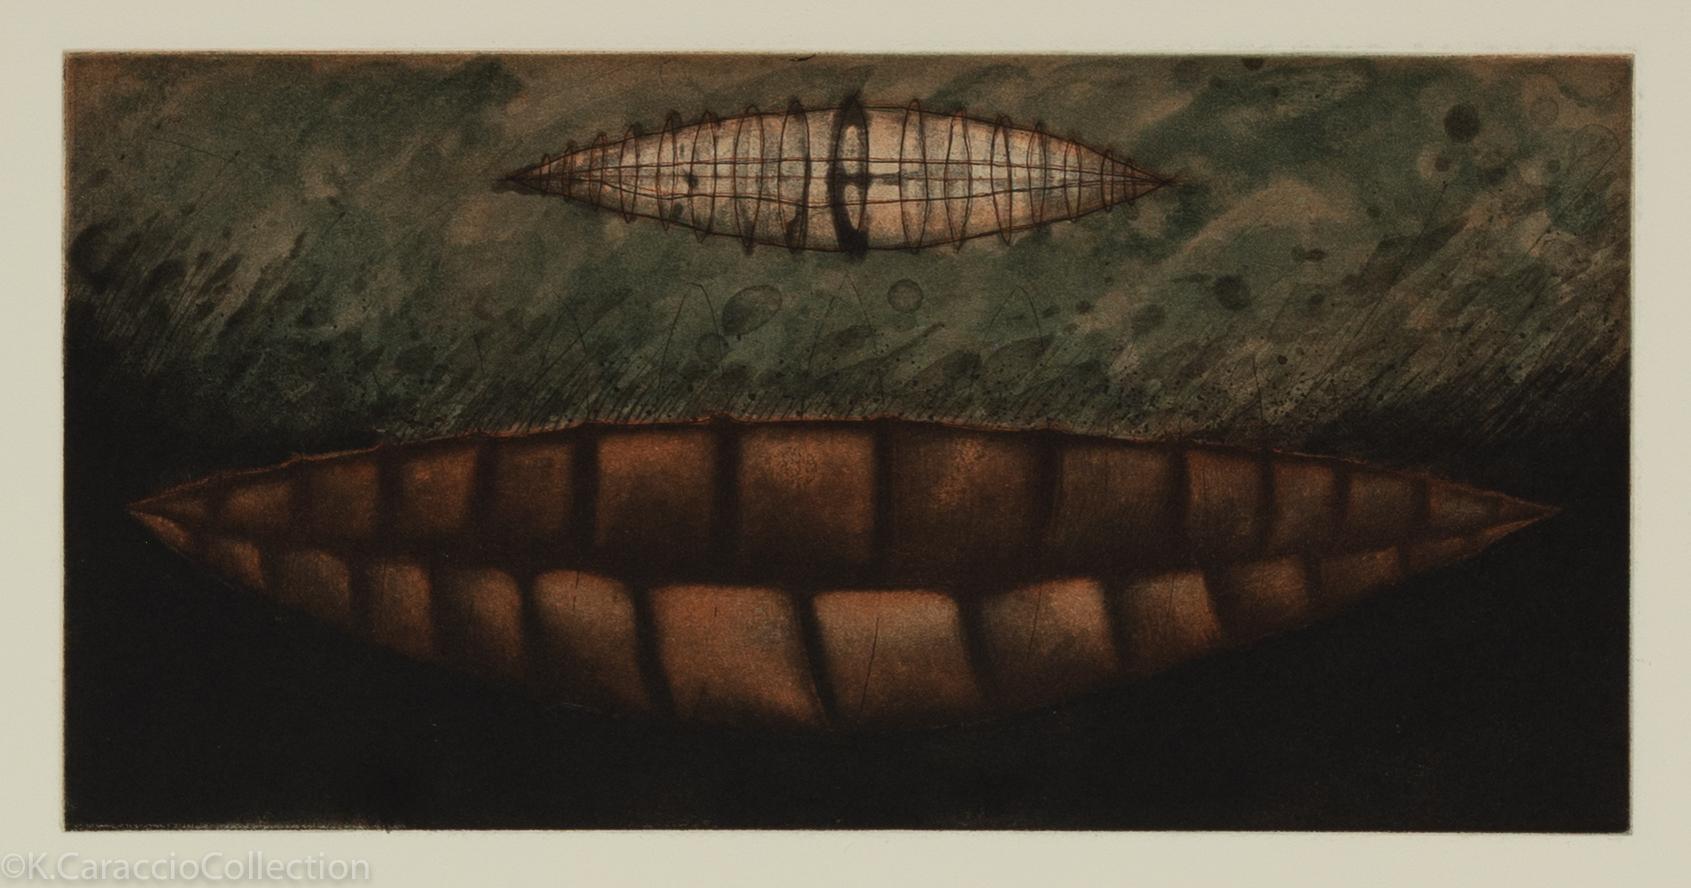 Sheltering, 1996